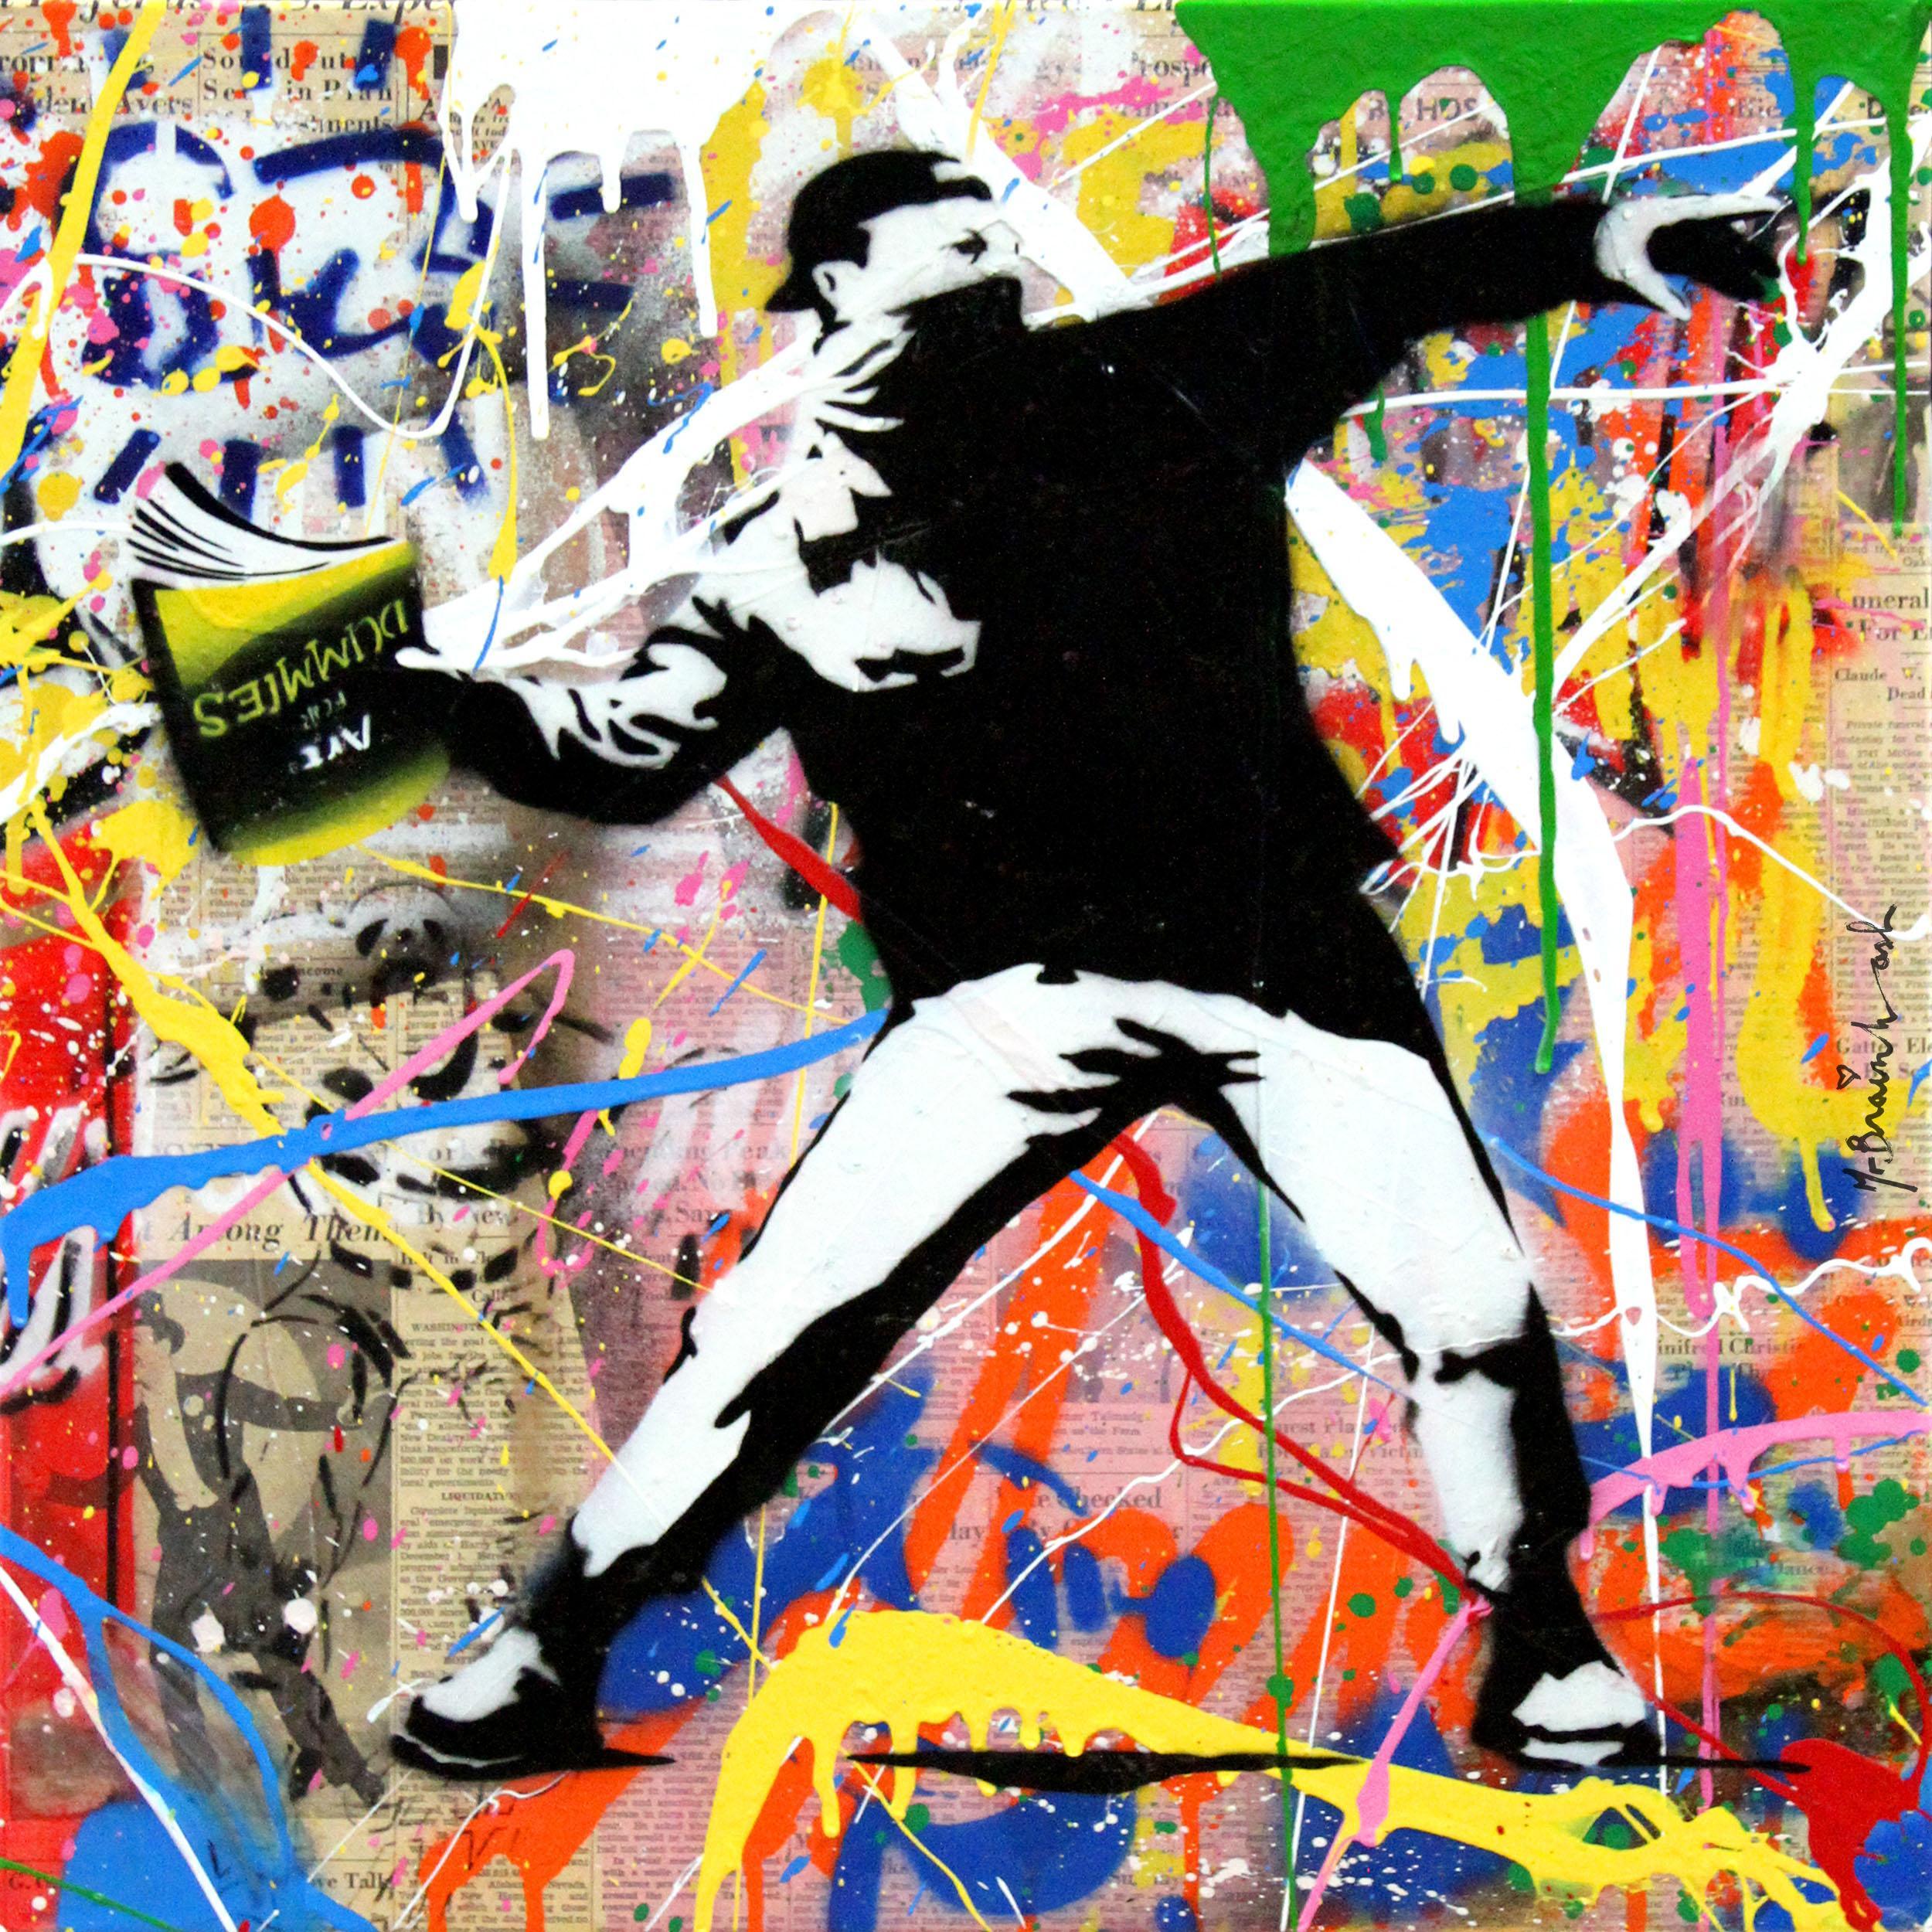 Banksy Thrower (12) by Mr. Brainwash